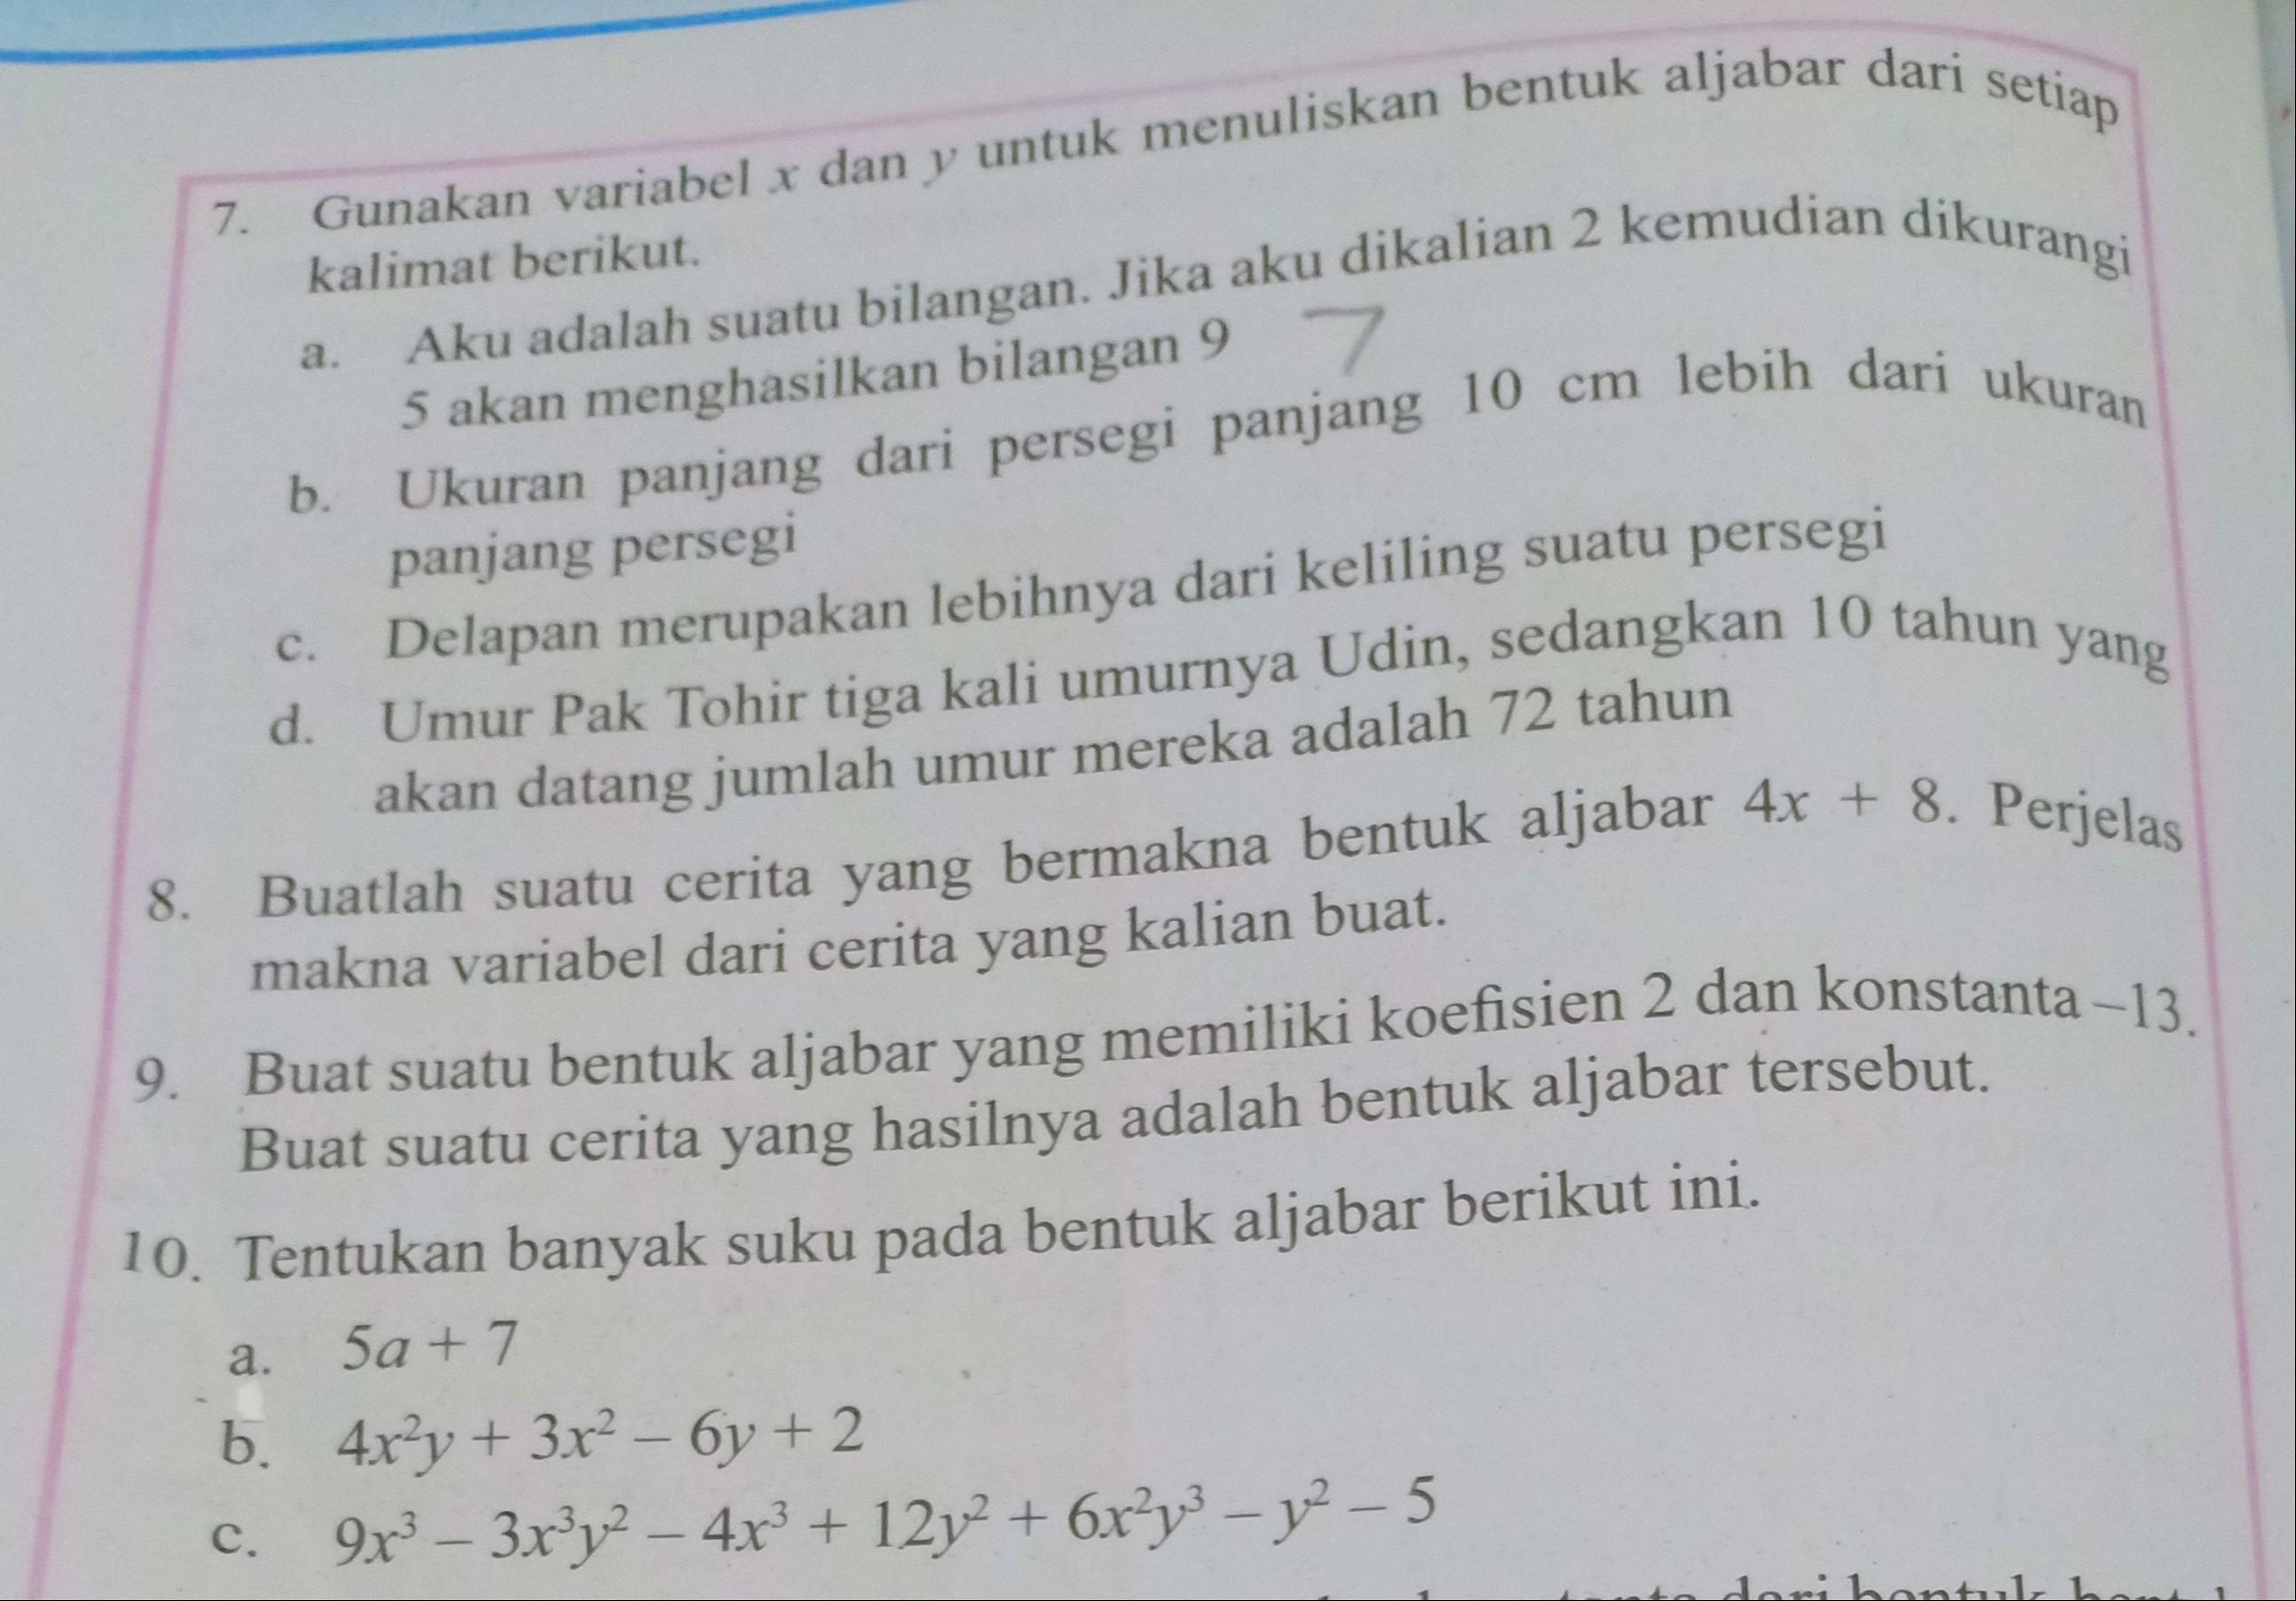 Matematika Kelas 7 Ayo Kita Berlatih 3 1 Hal 206 No 7 10 Brainly Co Id